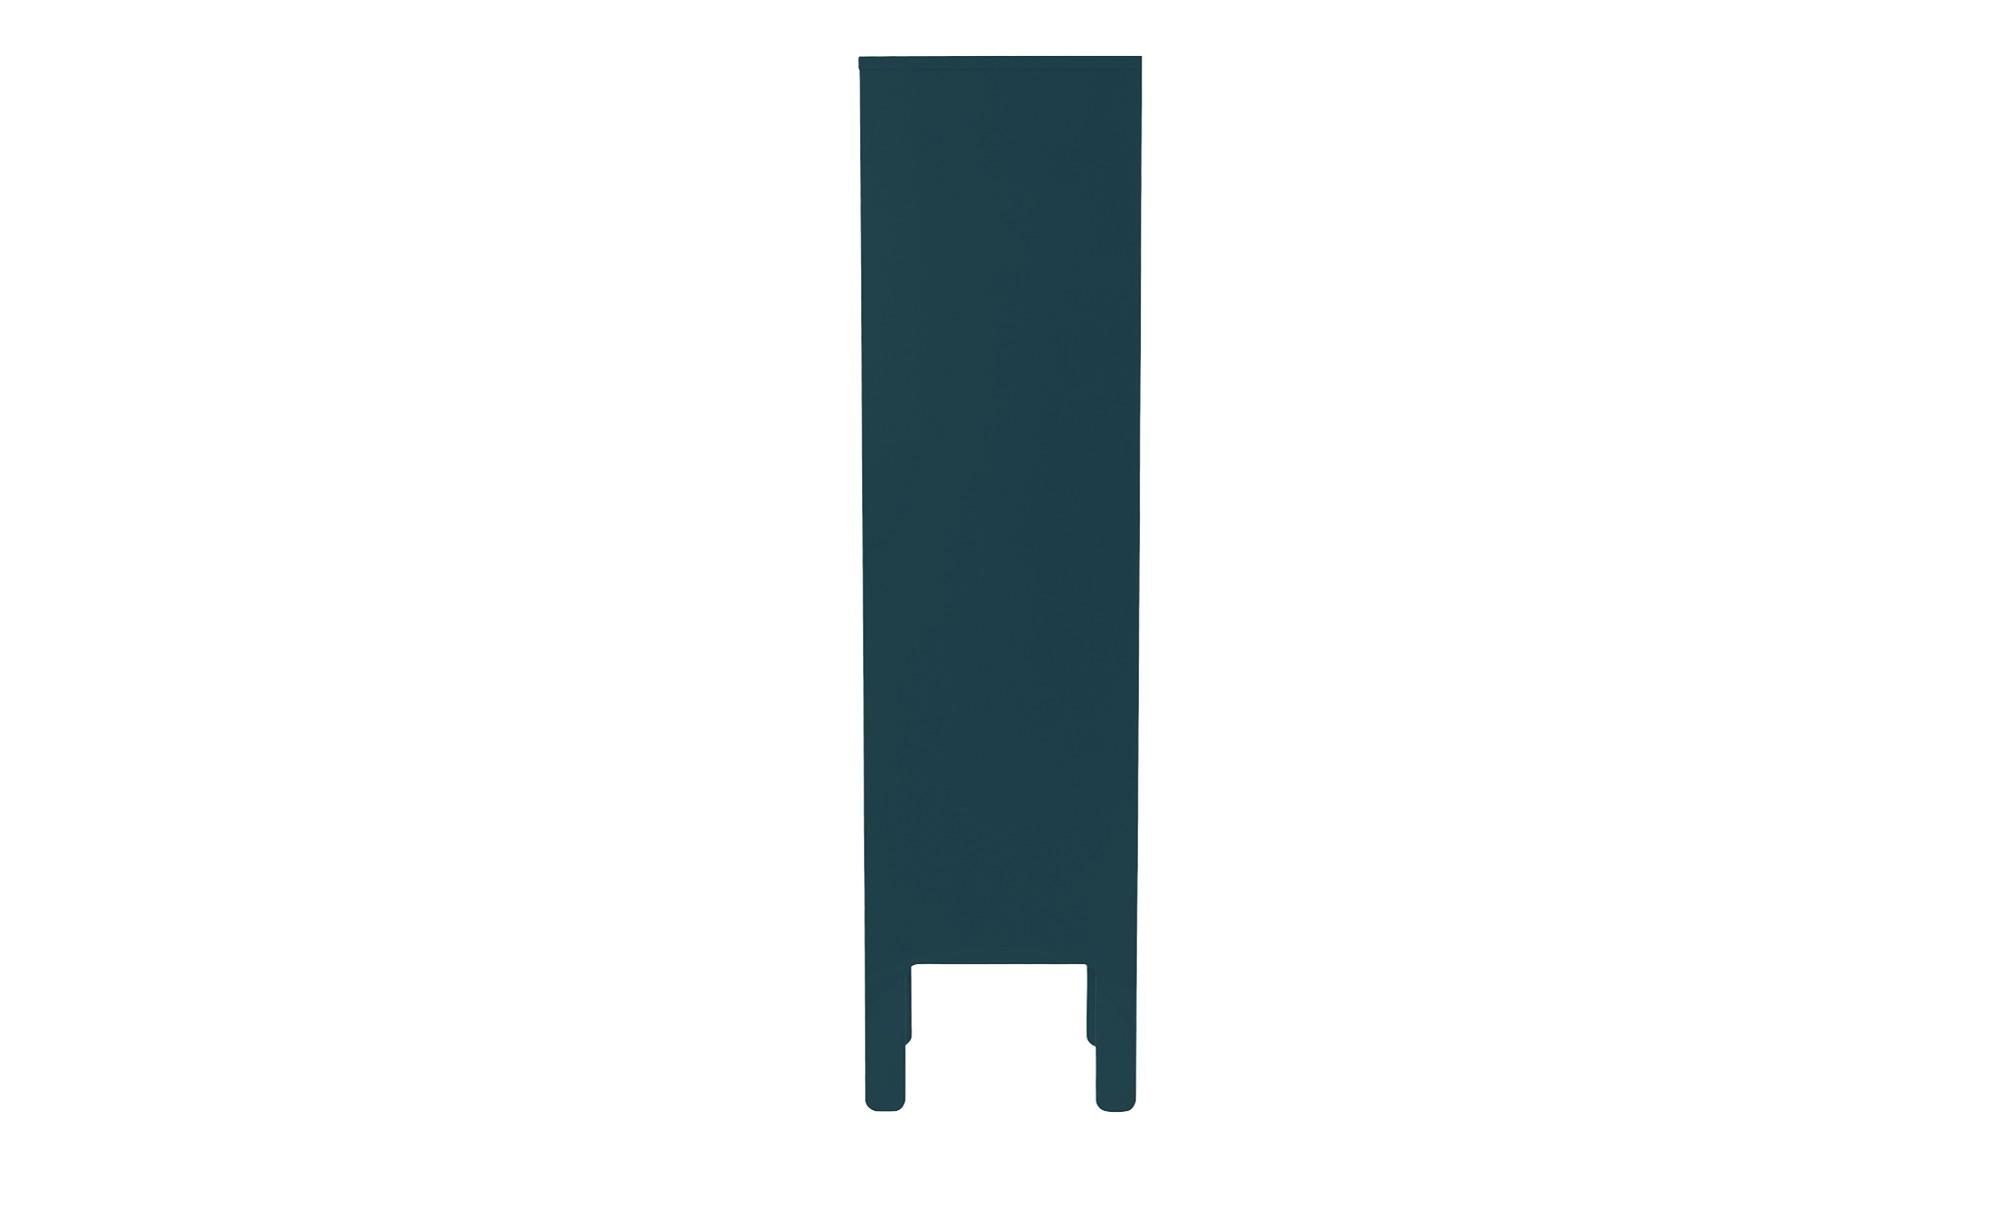 Highboard  Uno ¦ türkis/petrol ¦ Maße (cm): B: 40 H: 152 T: 40 Kommoden & Sideboards > Kommoden - Höffner